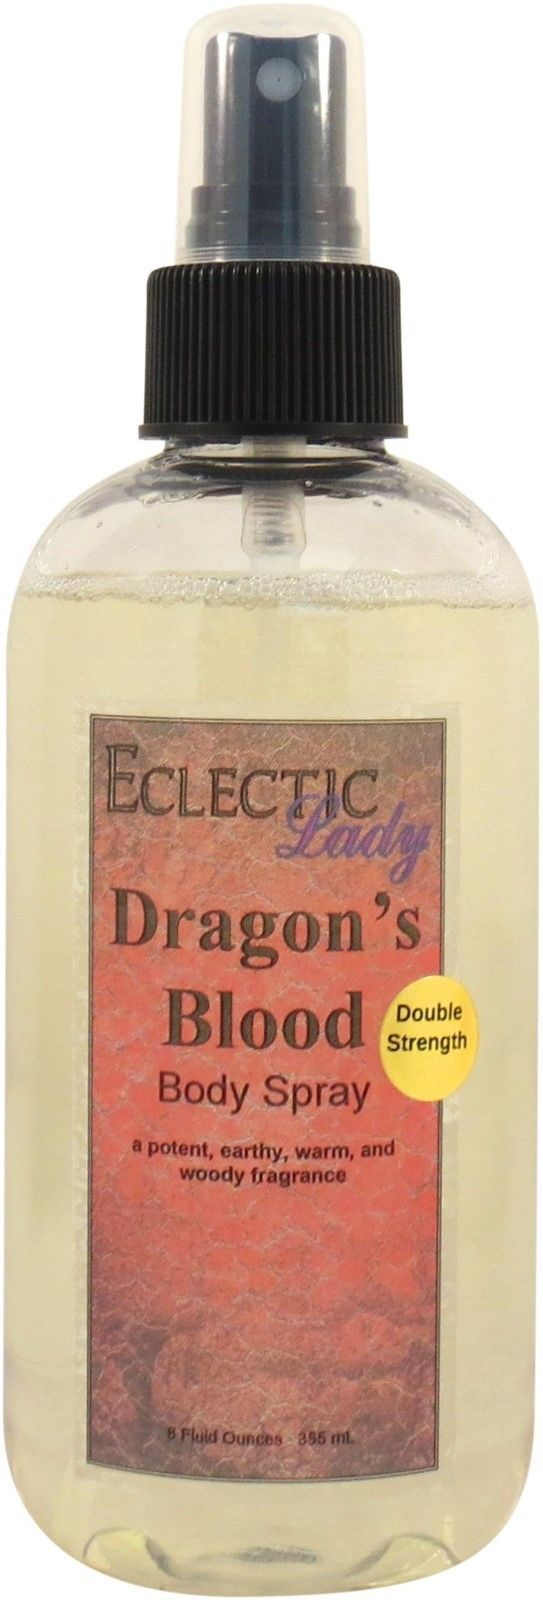 Dragon's Blood Body Spray